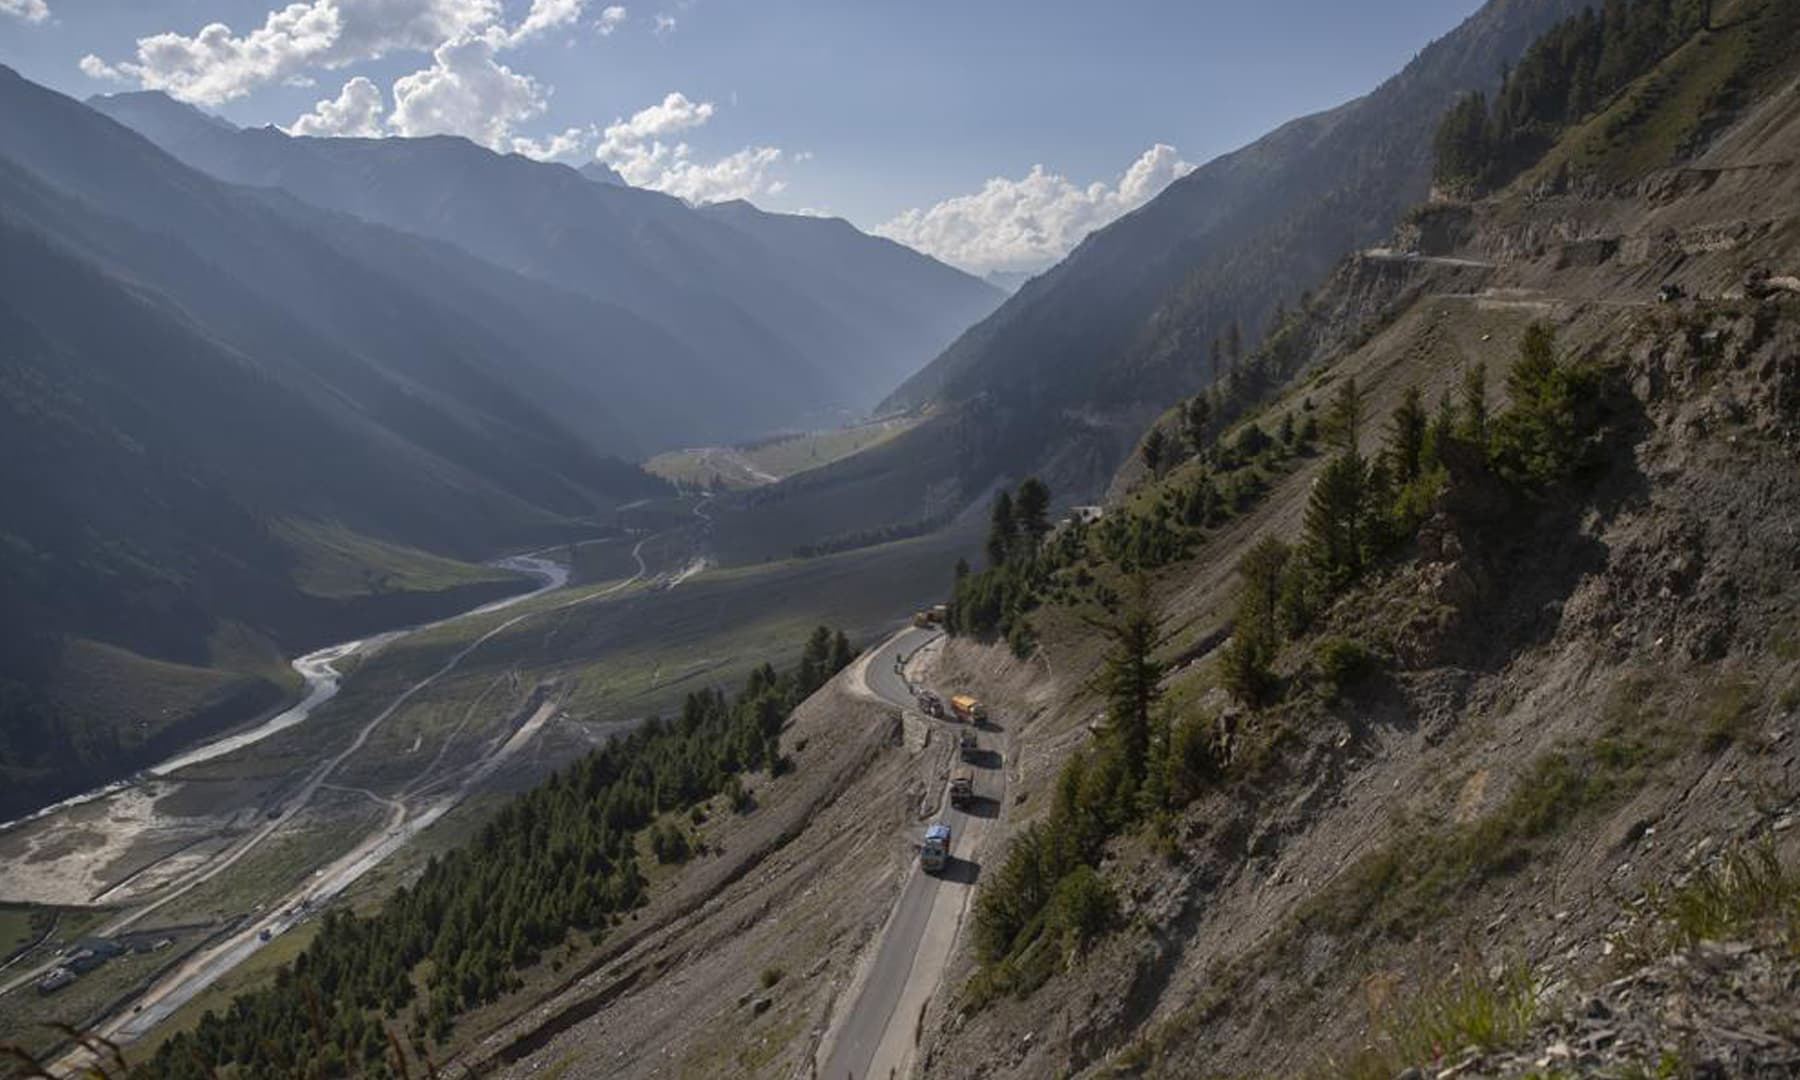 Vehicles run through the Zojila Pass northeast of Srinagar in Indian-occupied Kashmir. — AP